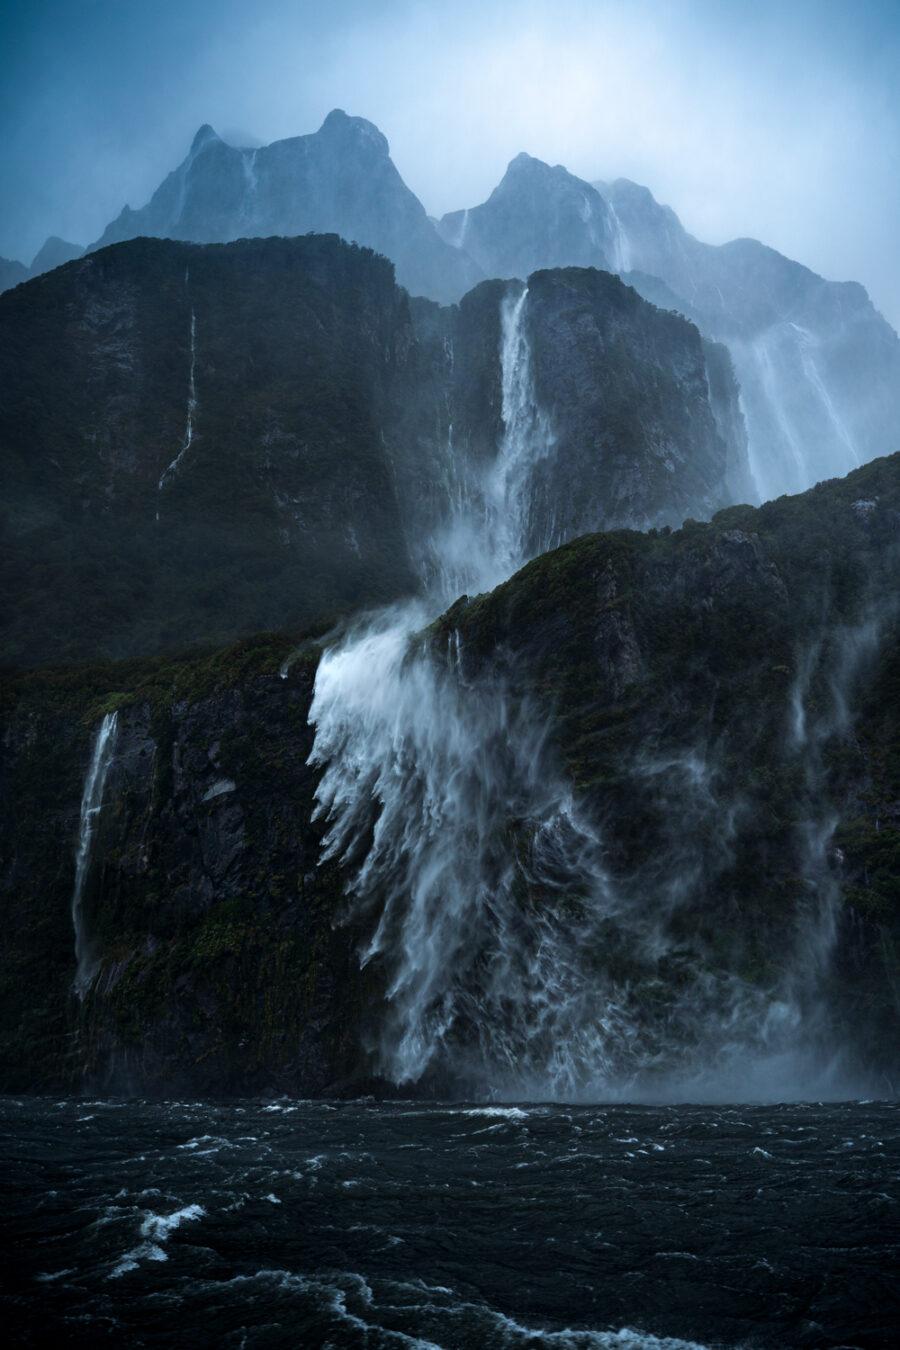 Wind and rain, Milford Sound waterfalls